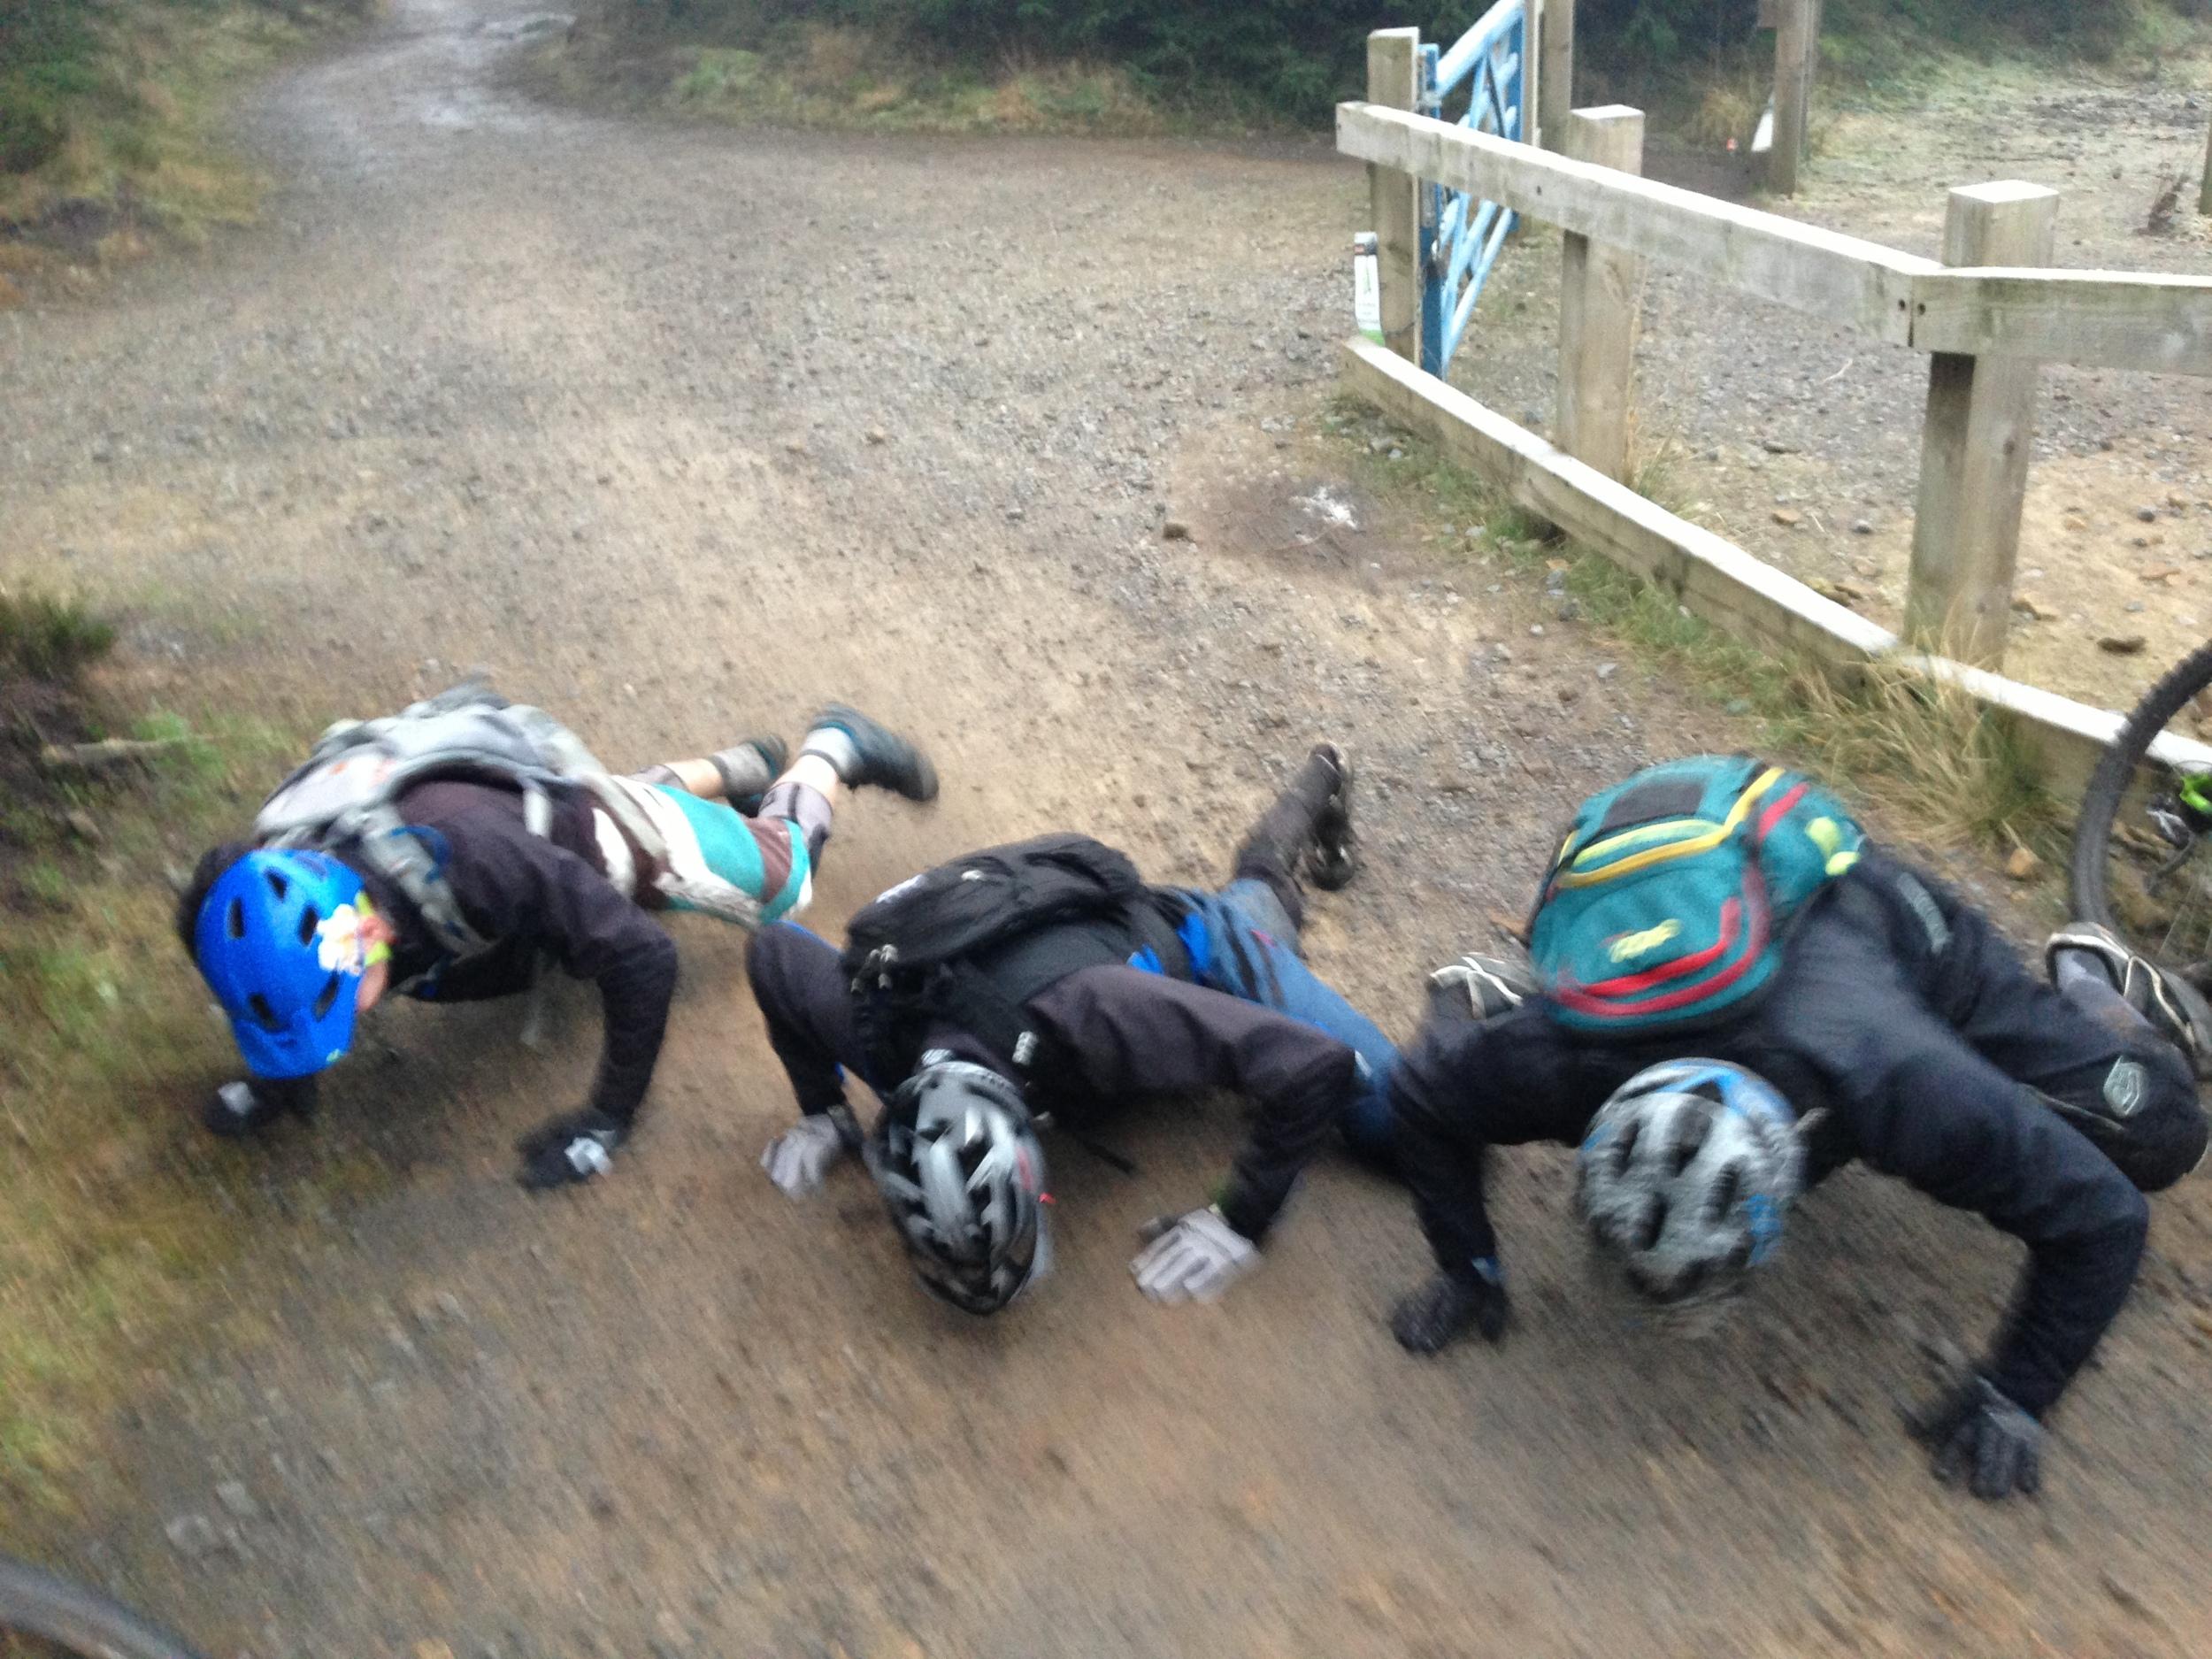 Blue Steel spider push ups on a recent ALine Hamsterley Social!